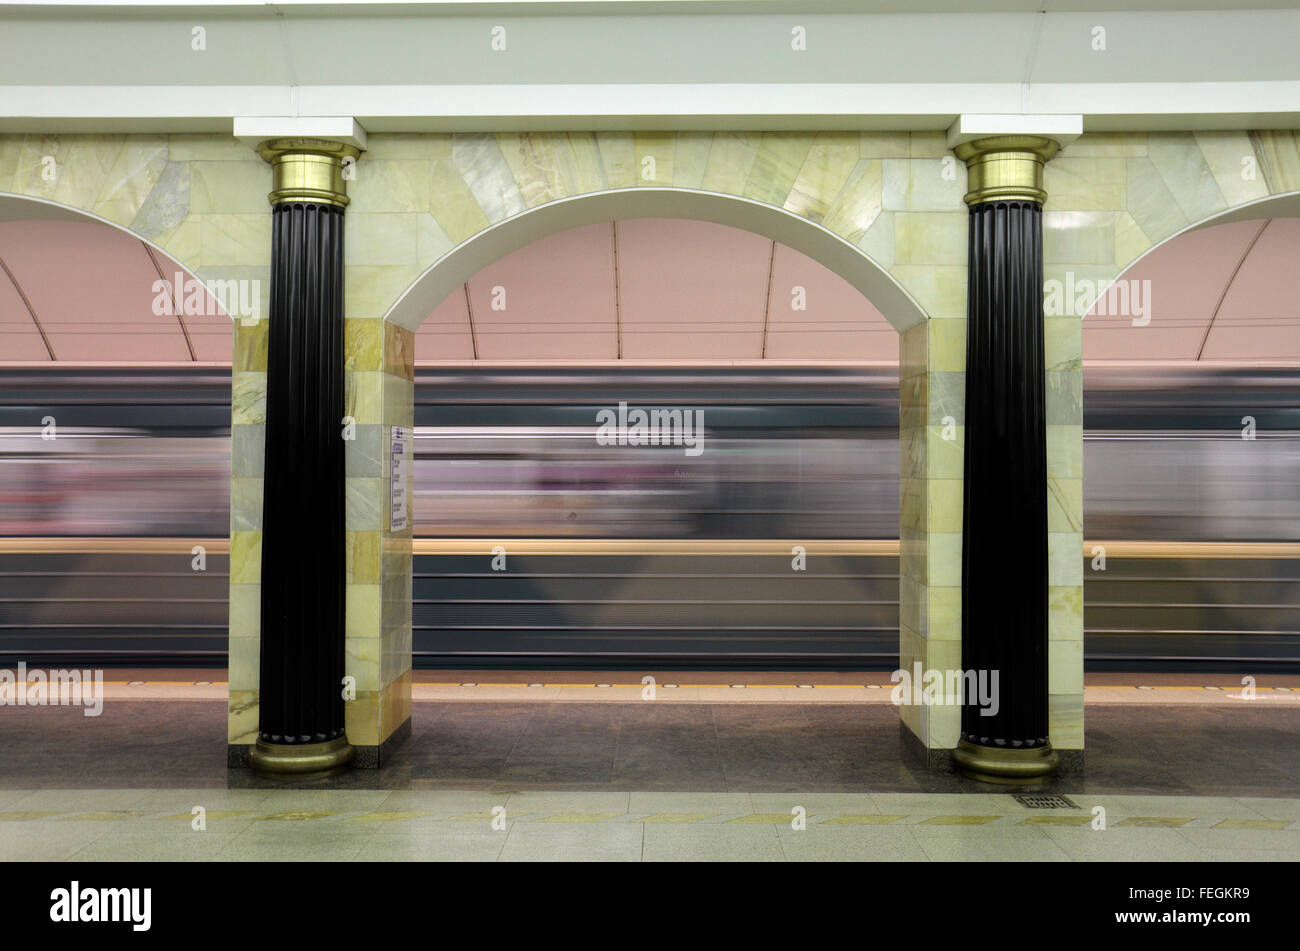 A Metro train accelerating away from the platform in the Admiralteyskaya Metro Station, Saint Petersburg, Russia. - Stock Image